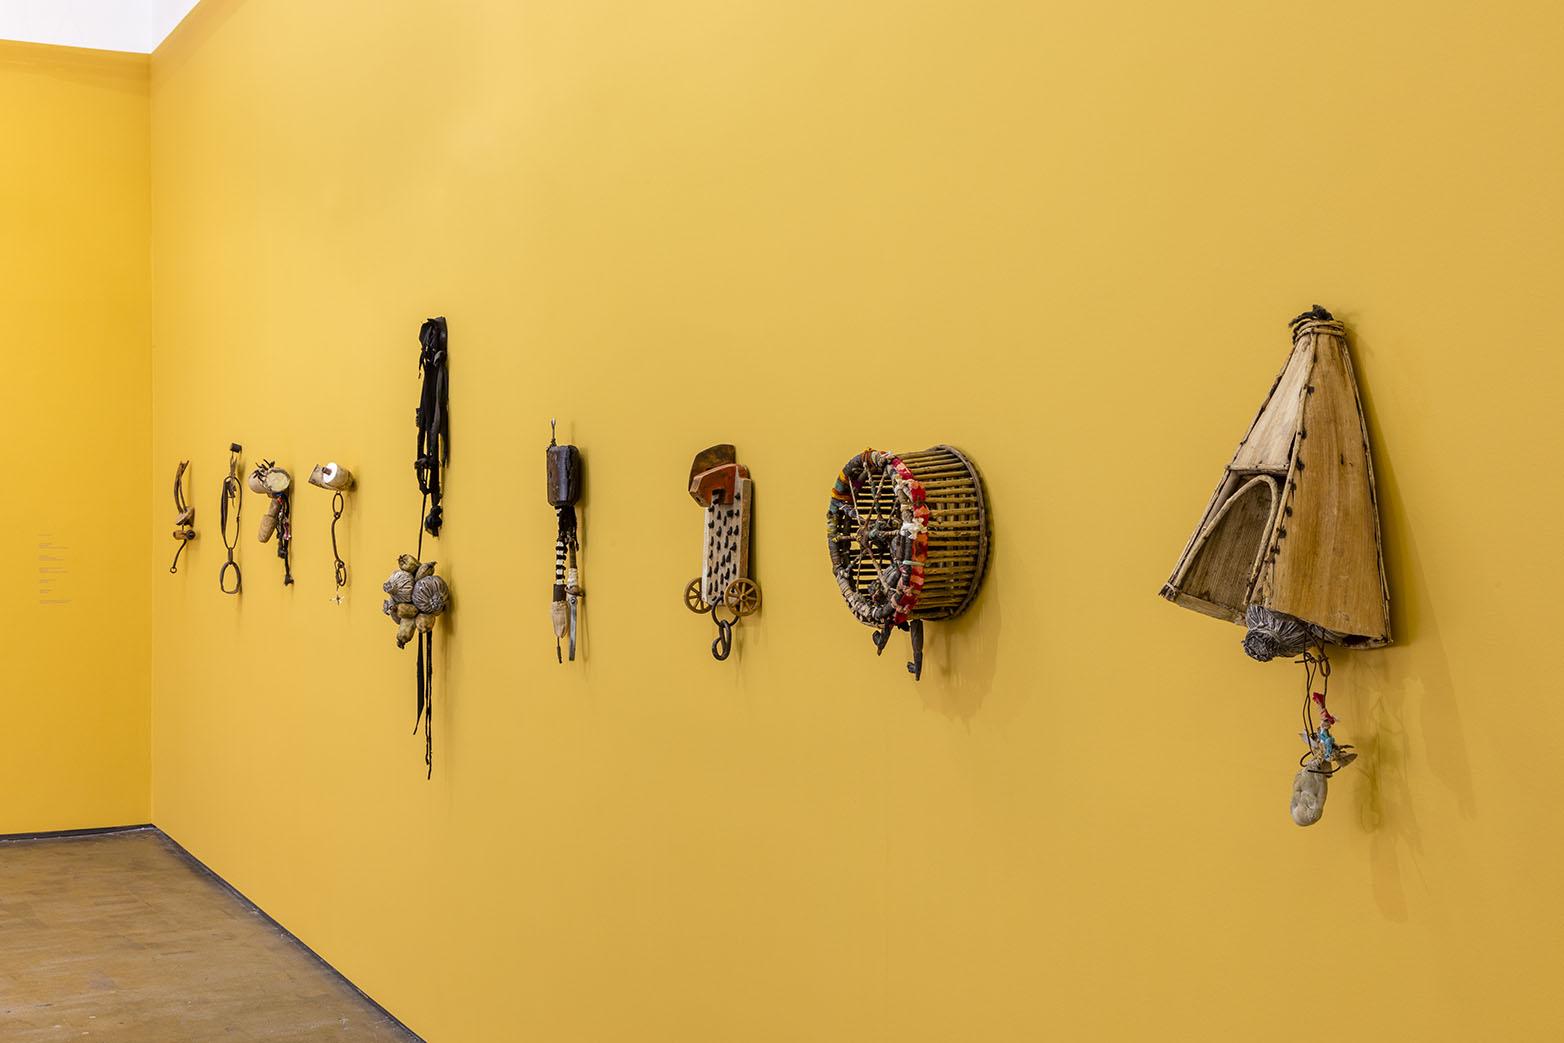 Installation view of John Outterbridge: Rag Man. Art + Practice, Los Angeles. December 12, 2015 - February 27, 2016. Photo: Joshua White/JWPictures.com.